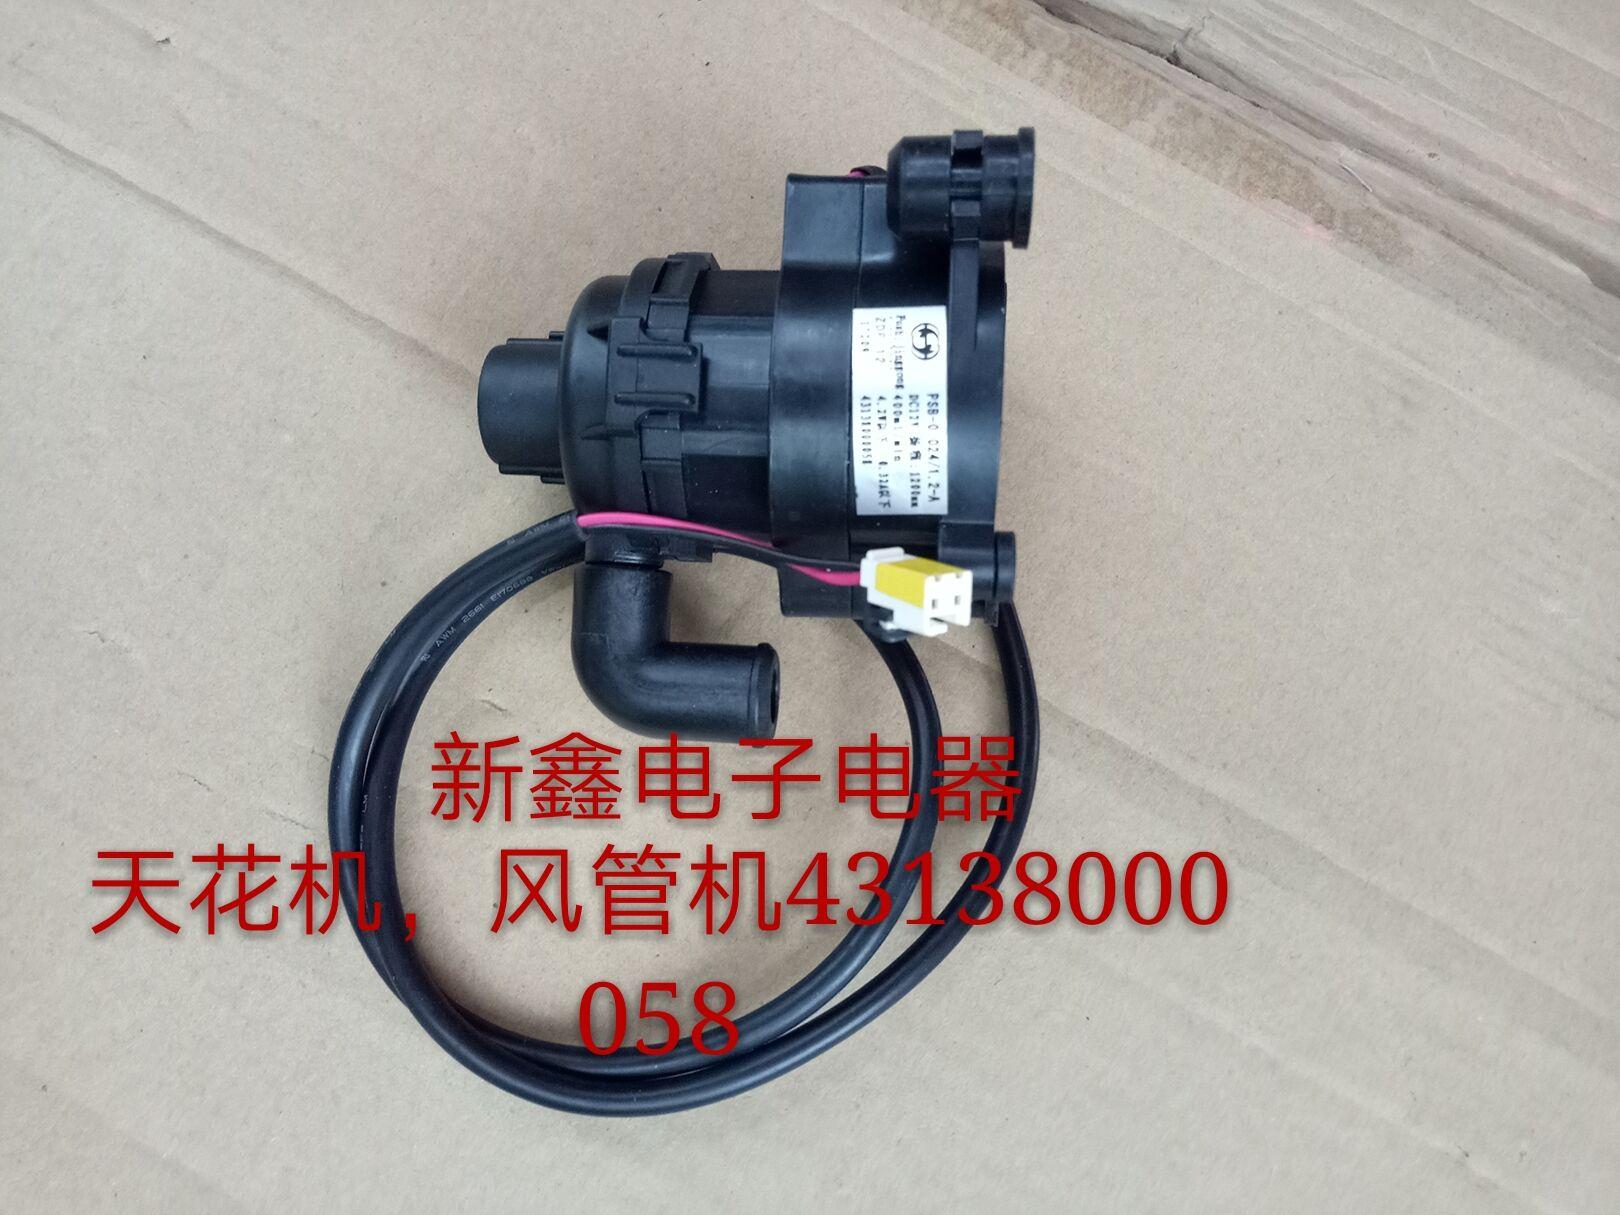 GREE Wind pocken - Drainage - Motor 4313800005812V spannung.